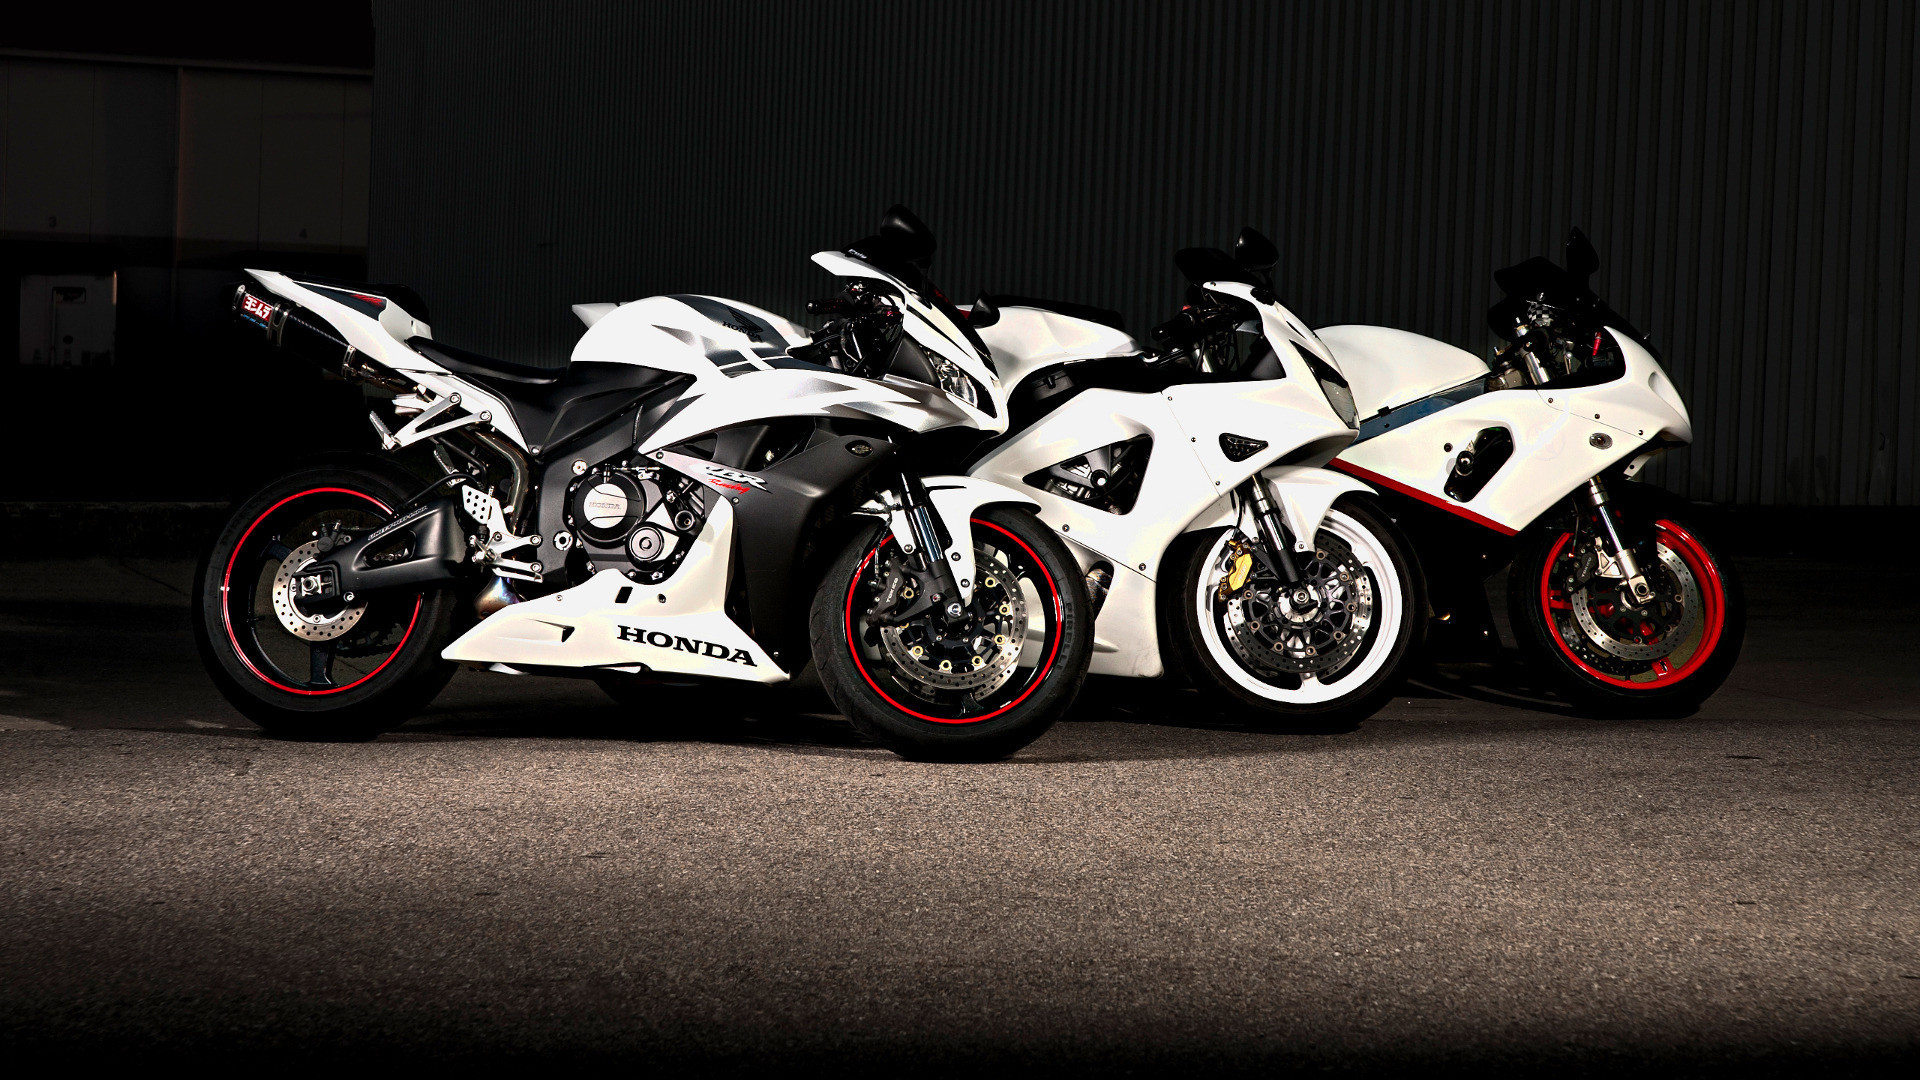 Honda Bikes HD Wallpapers Free Downloads